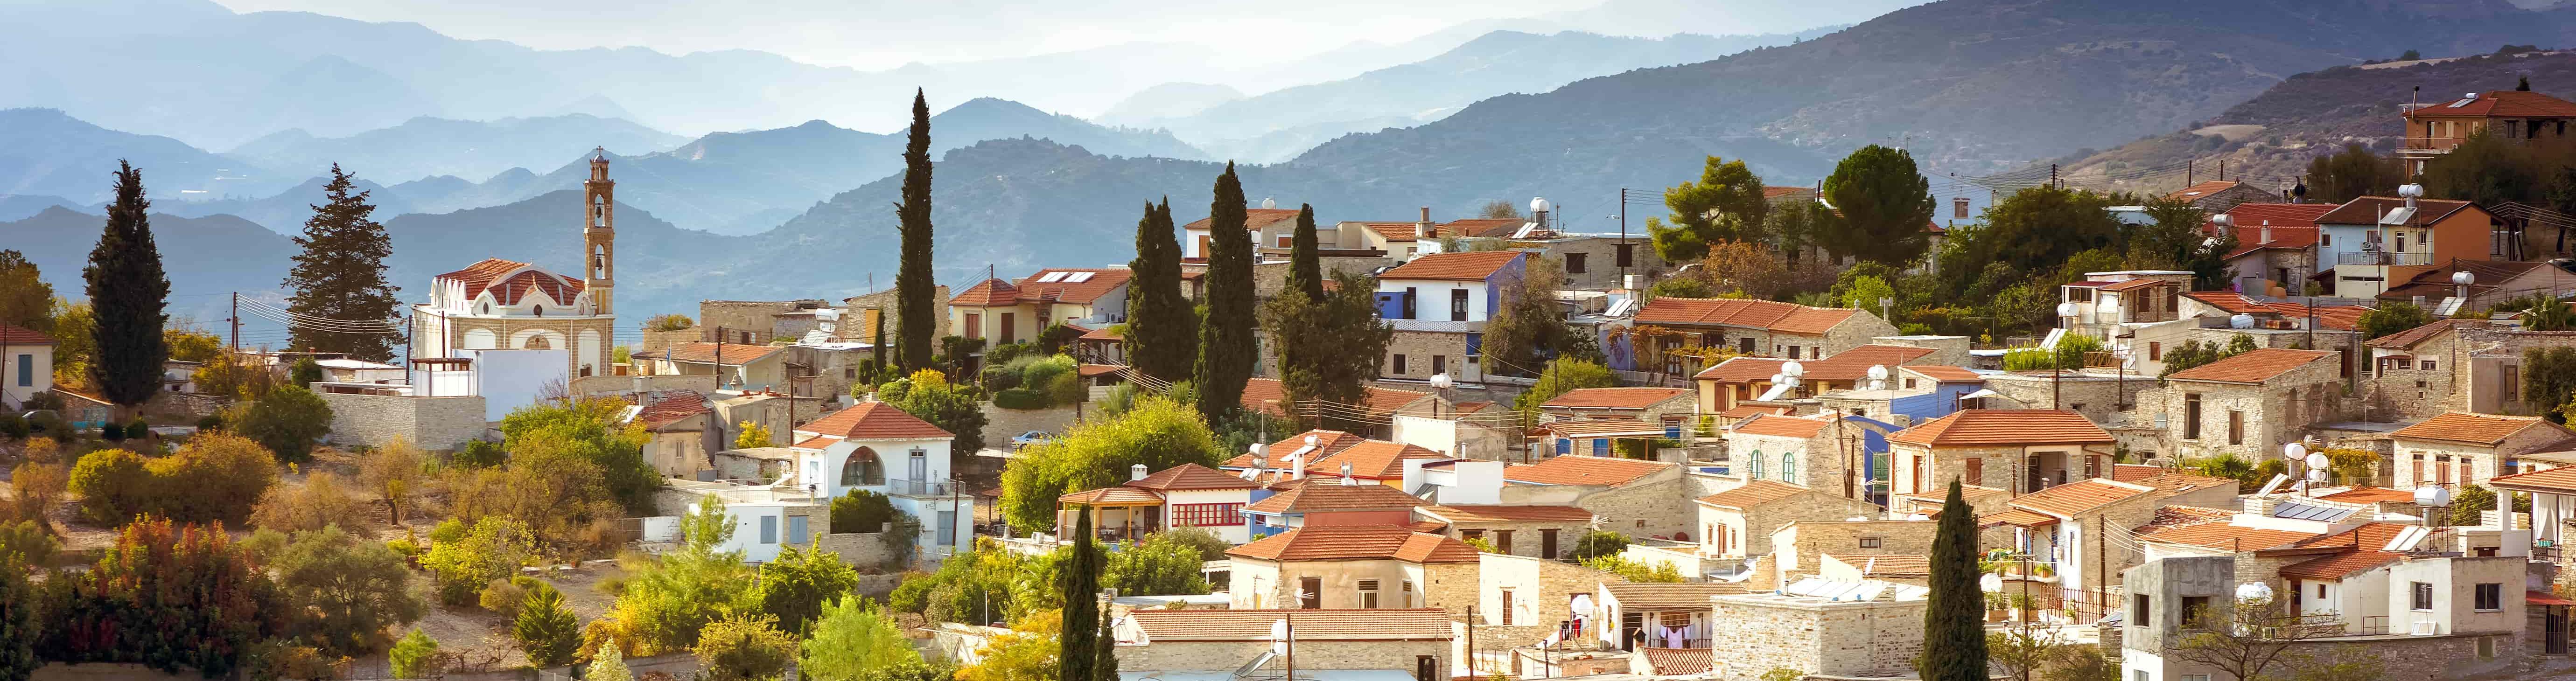 We start flights to European resorts: SkyUp operated its first flight to Larnaca